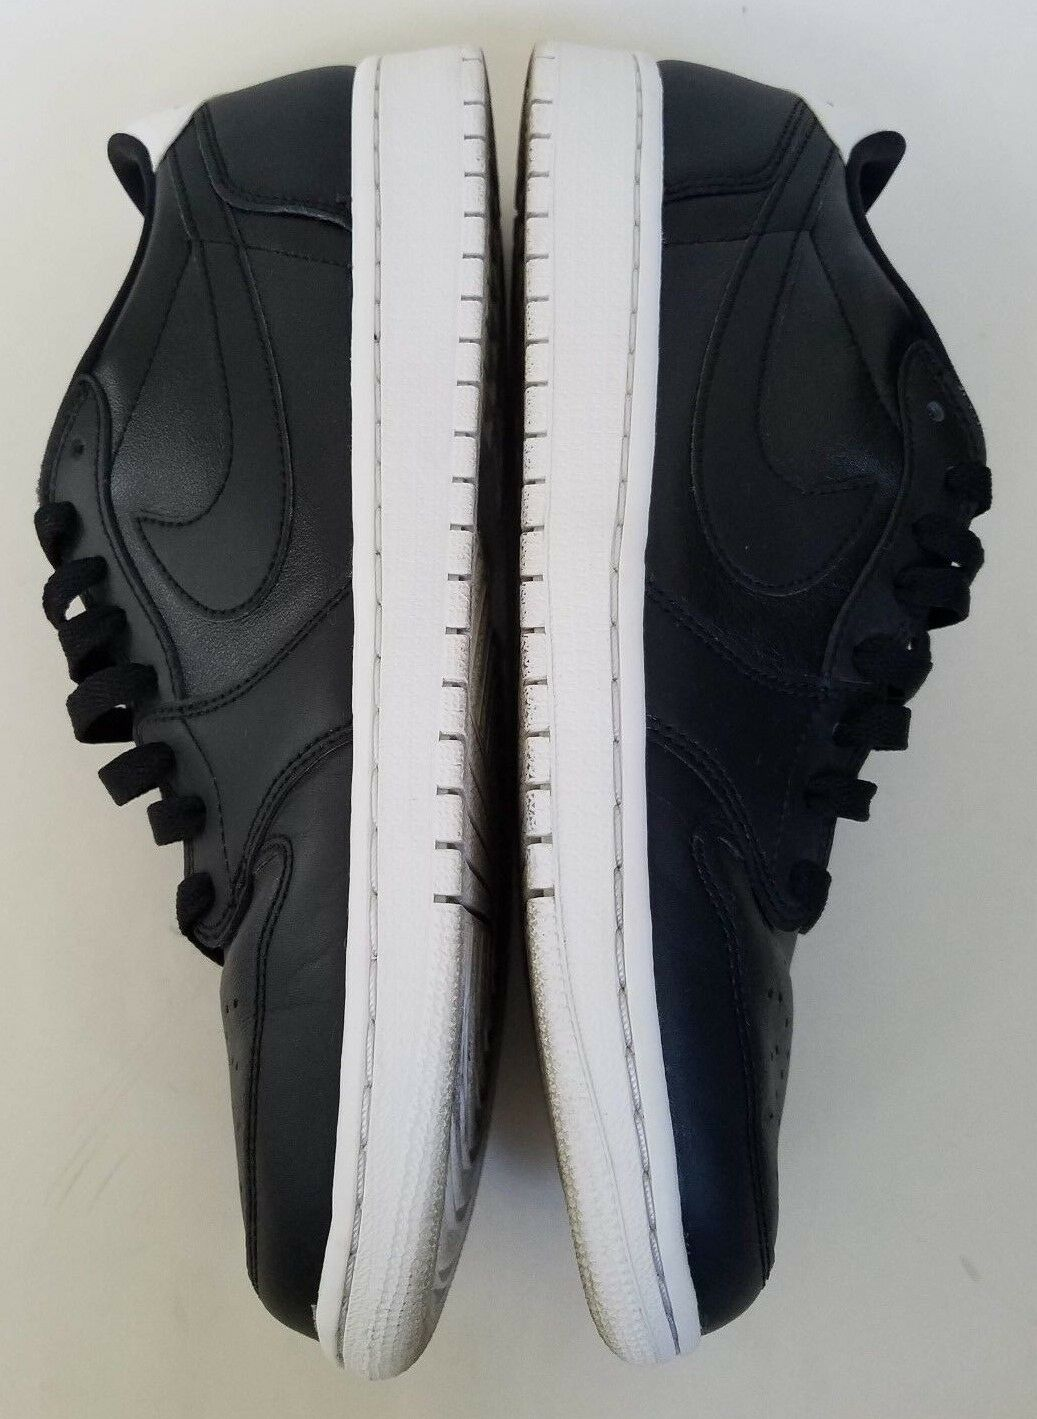 Nike Air Jordan 1 Low Low 1 OG Cyber Monday MENS Size 10.5 705329-010 7e0844